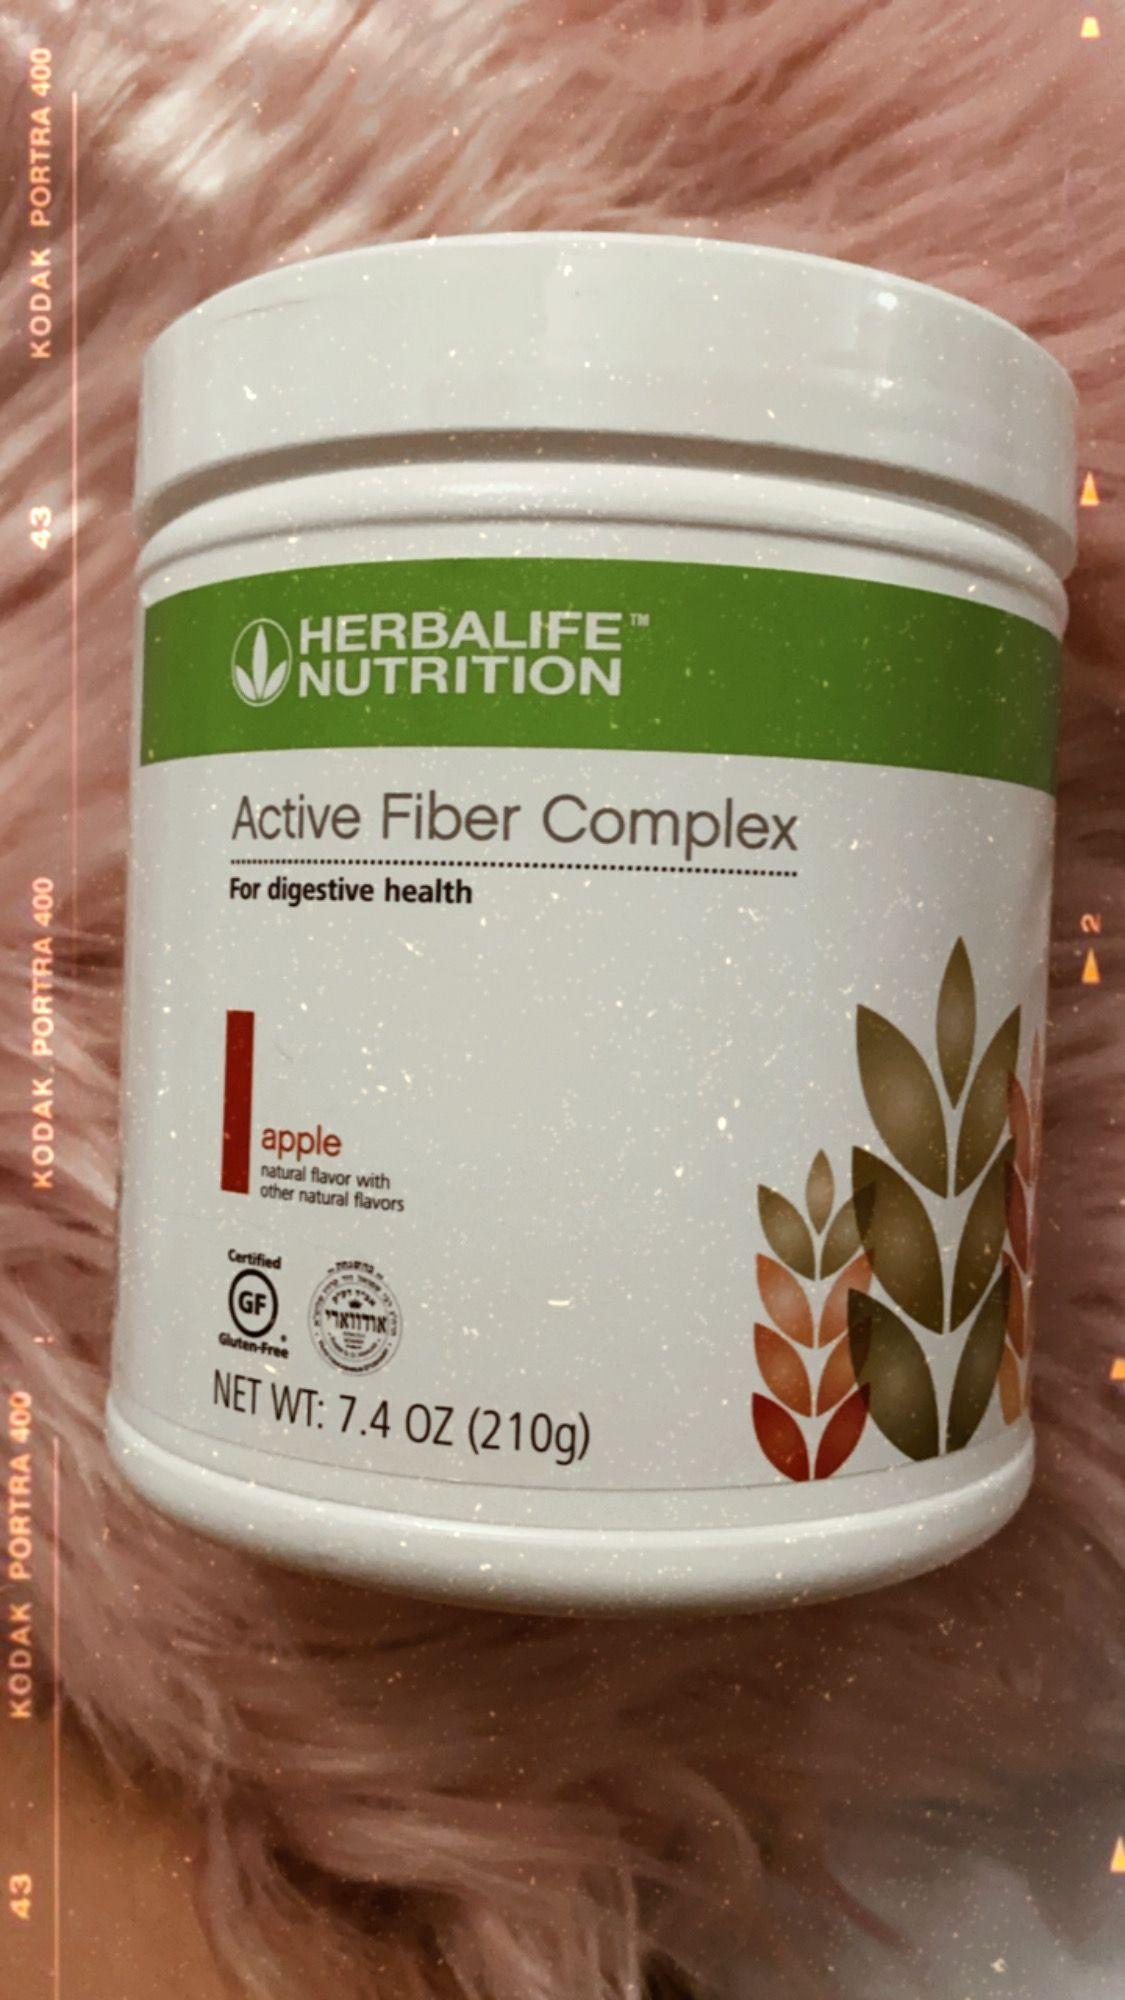 Herbalife Active Fiber Complex In 2020 Nutrition Blog Herbalife Nutrition